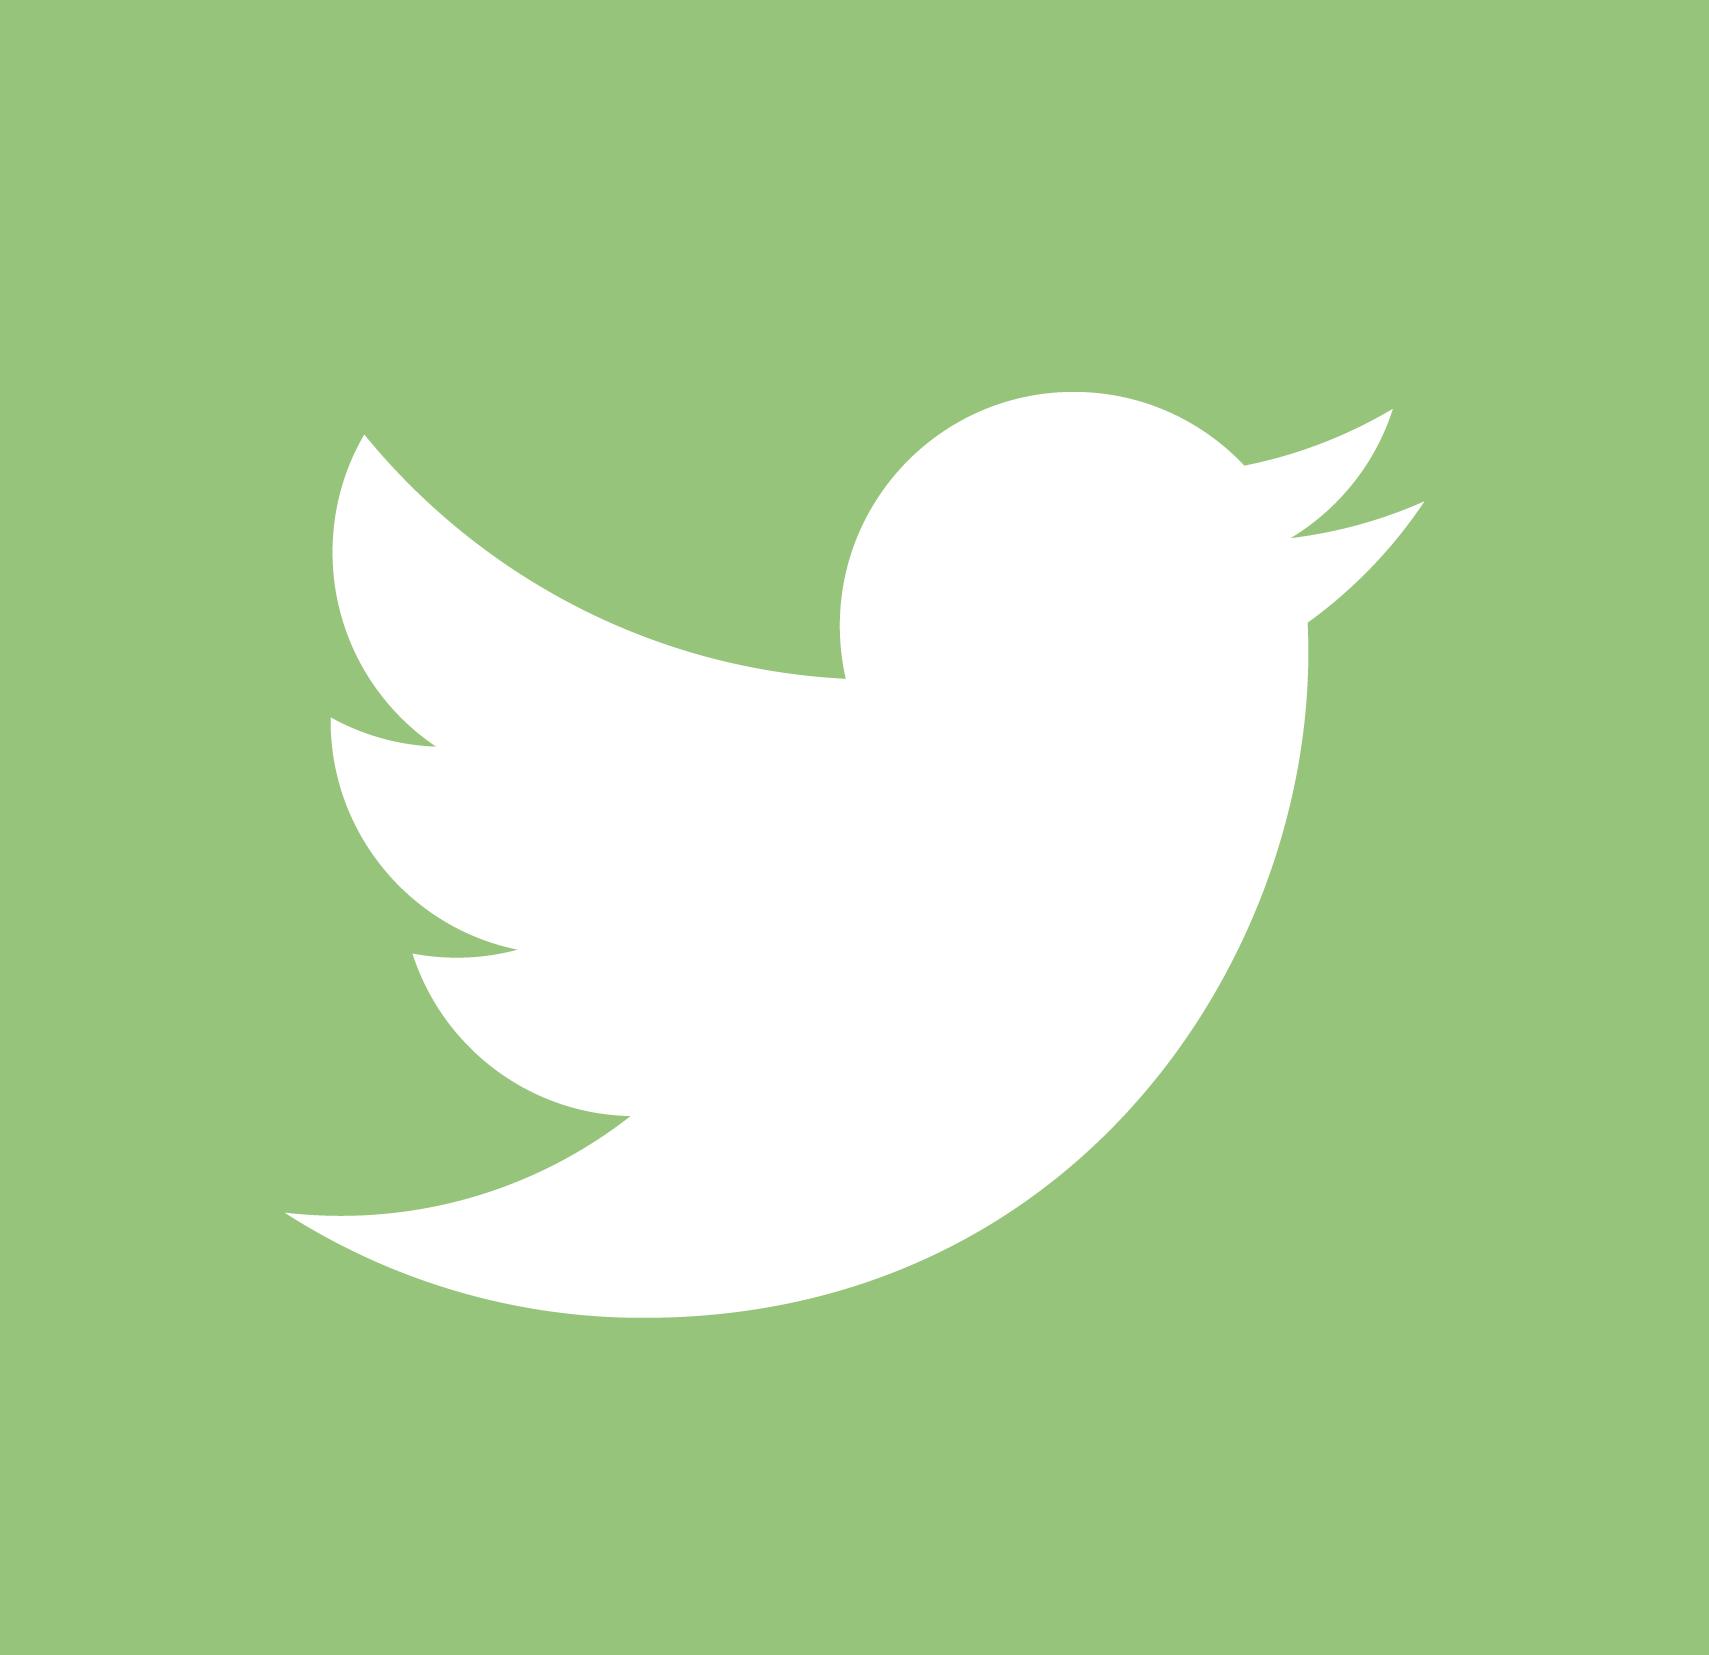 AB-Twitter